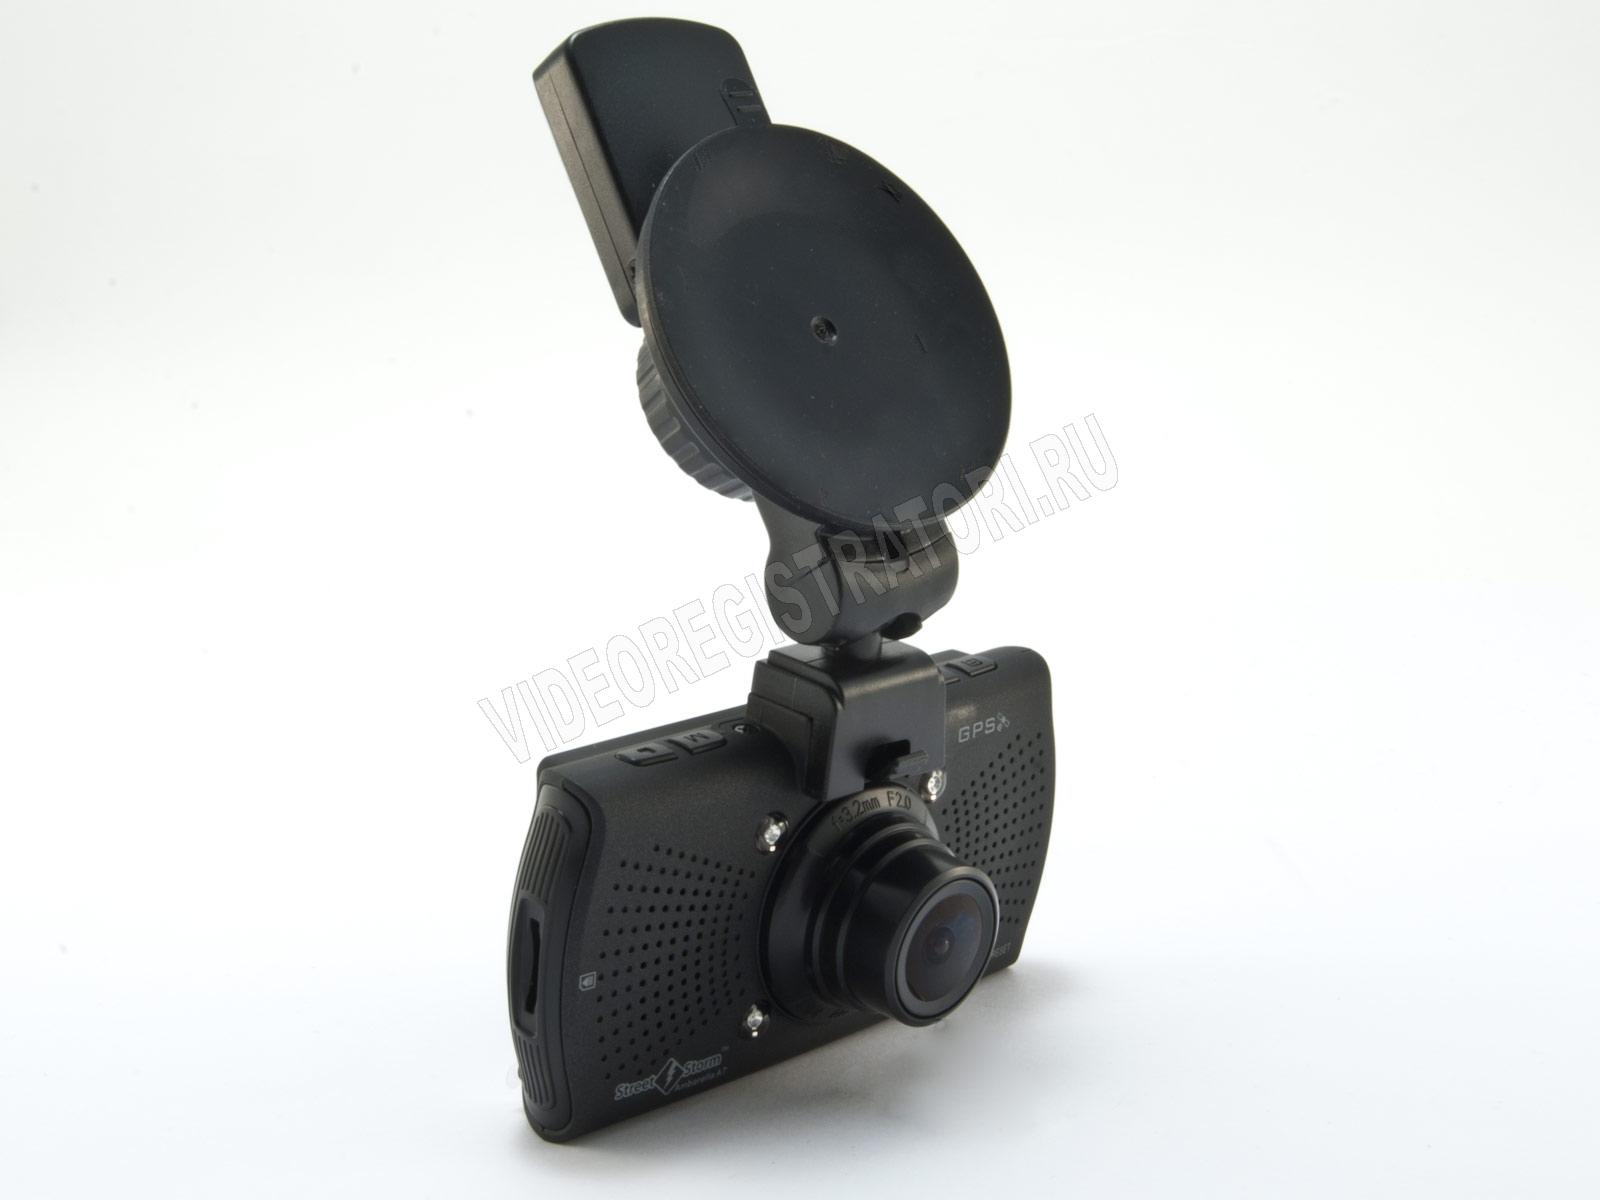 Кронштейн для камер Hikvision DS-1273ZJ-130B алюминиевый